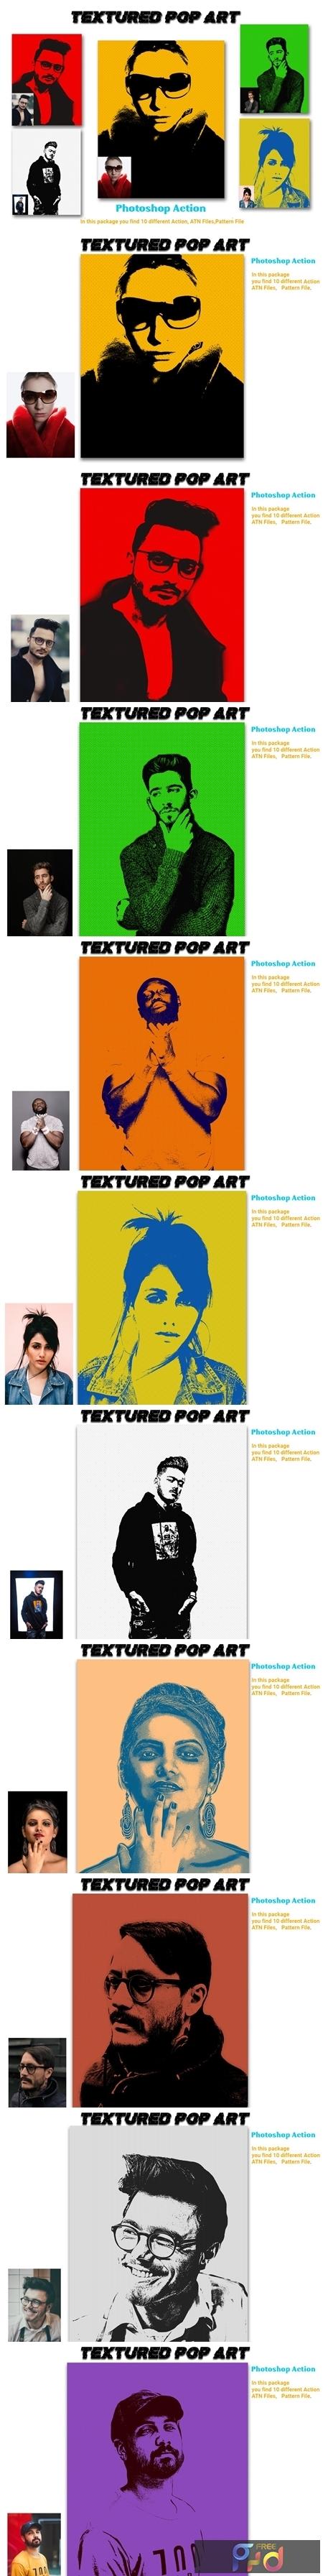 Textured Pop Art Photoshop Action 4578289 1